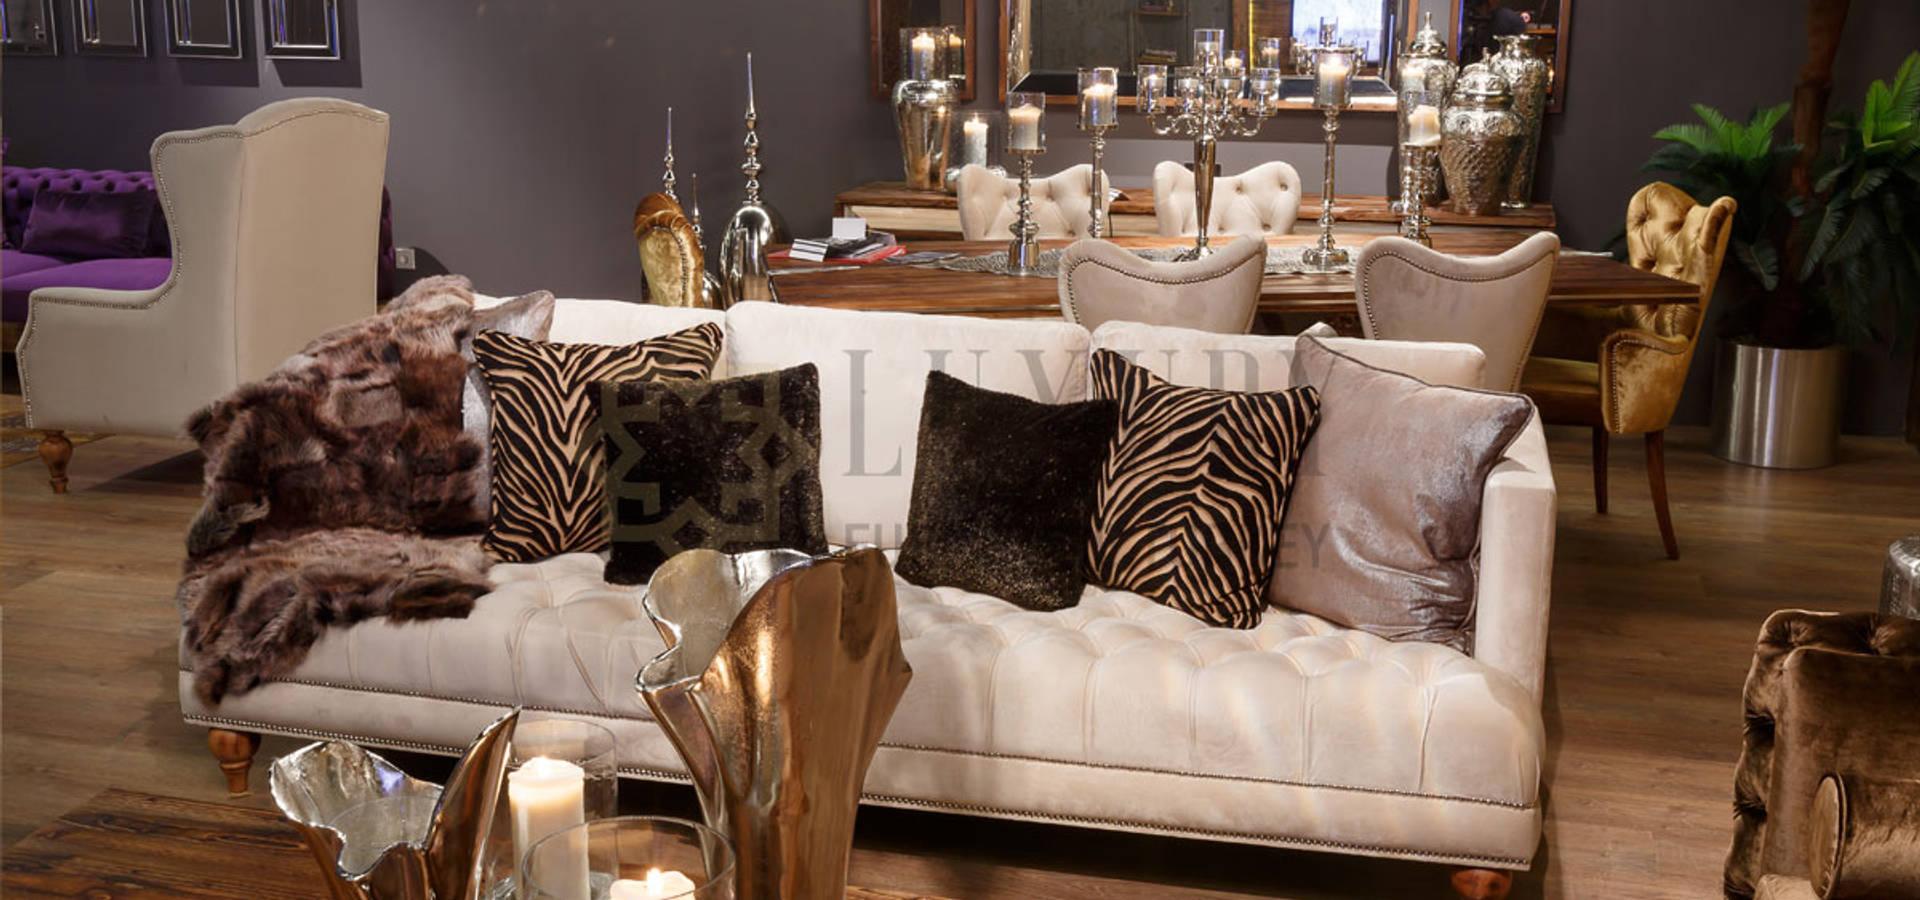 Luxury Furniture Turkey